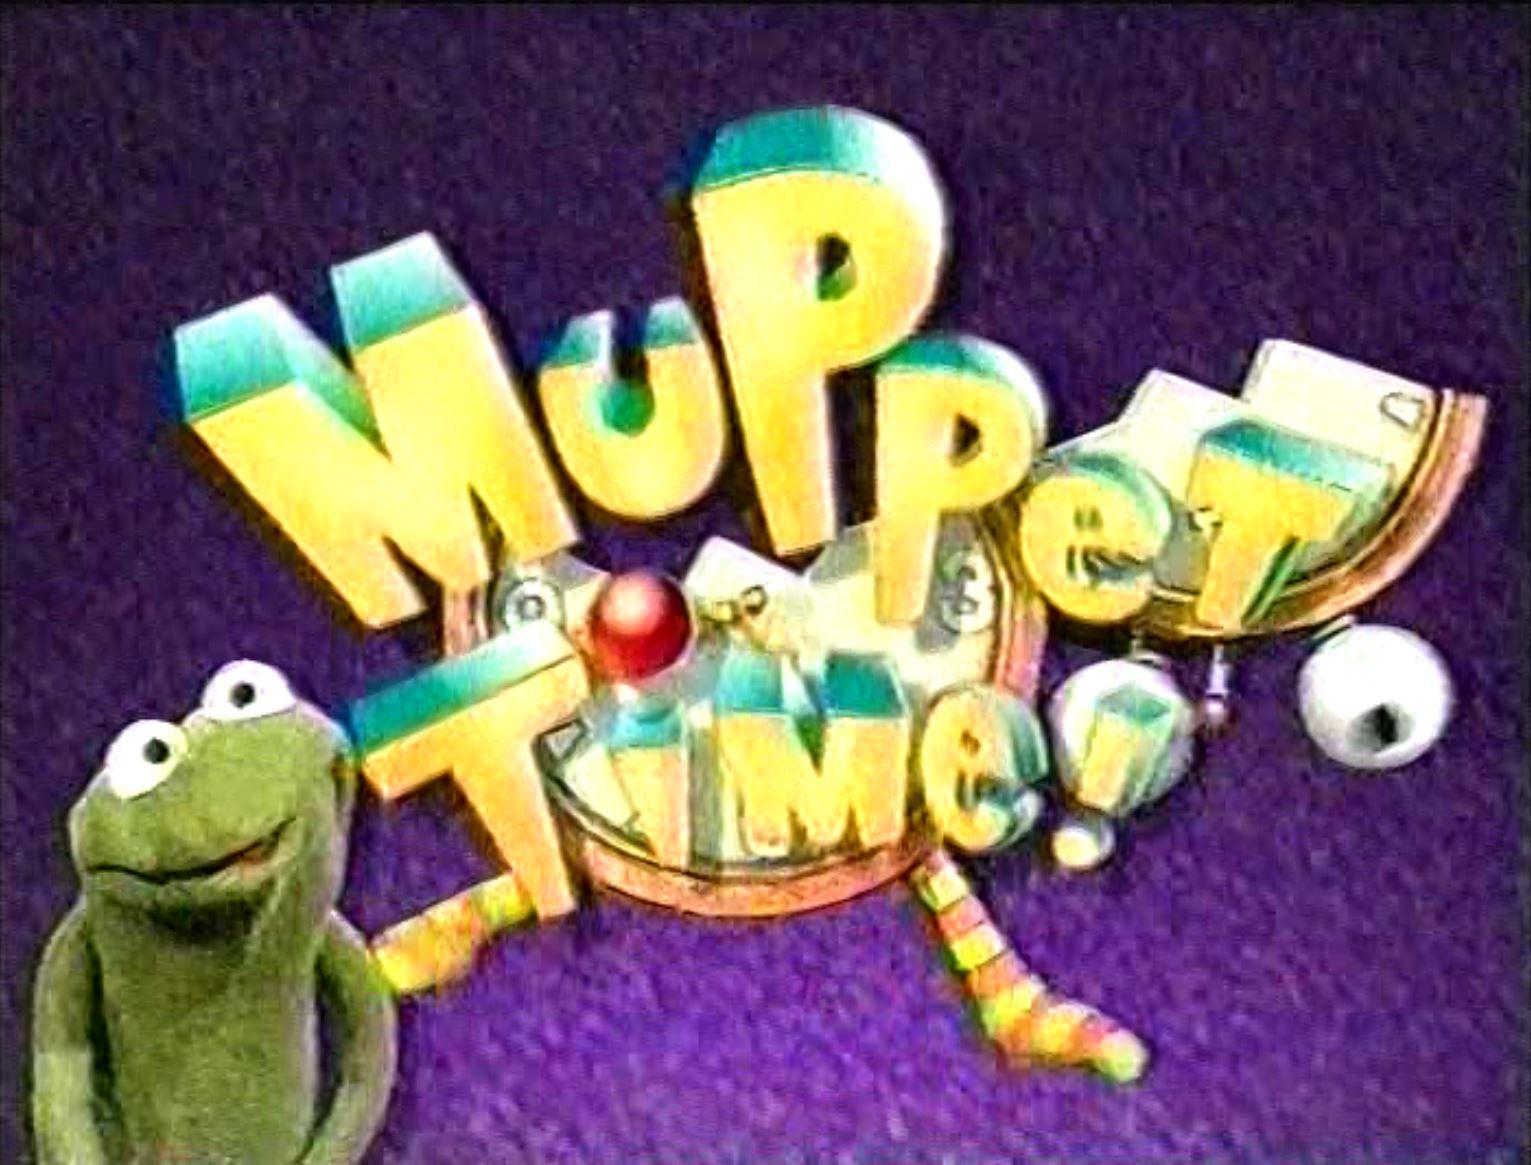 File:Muppettime.jpg